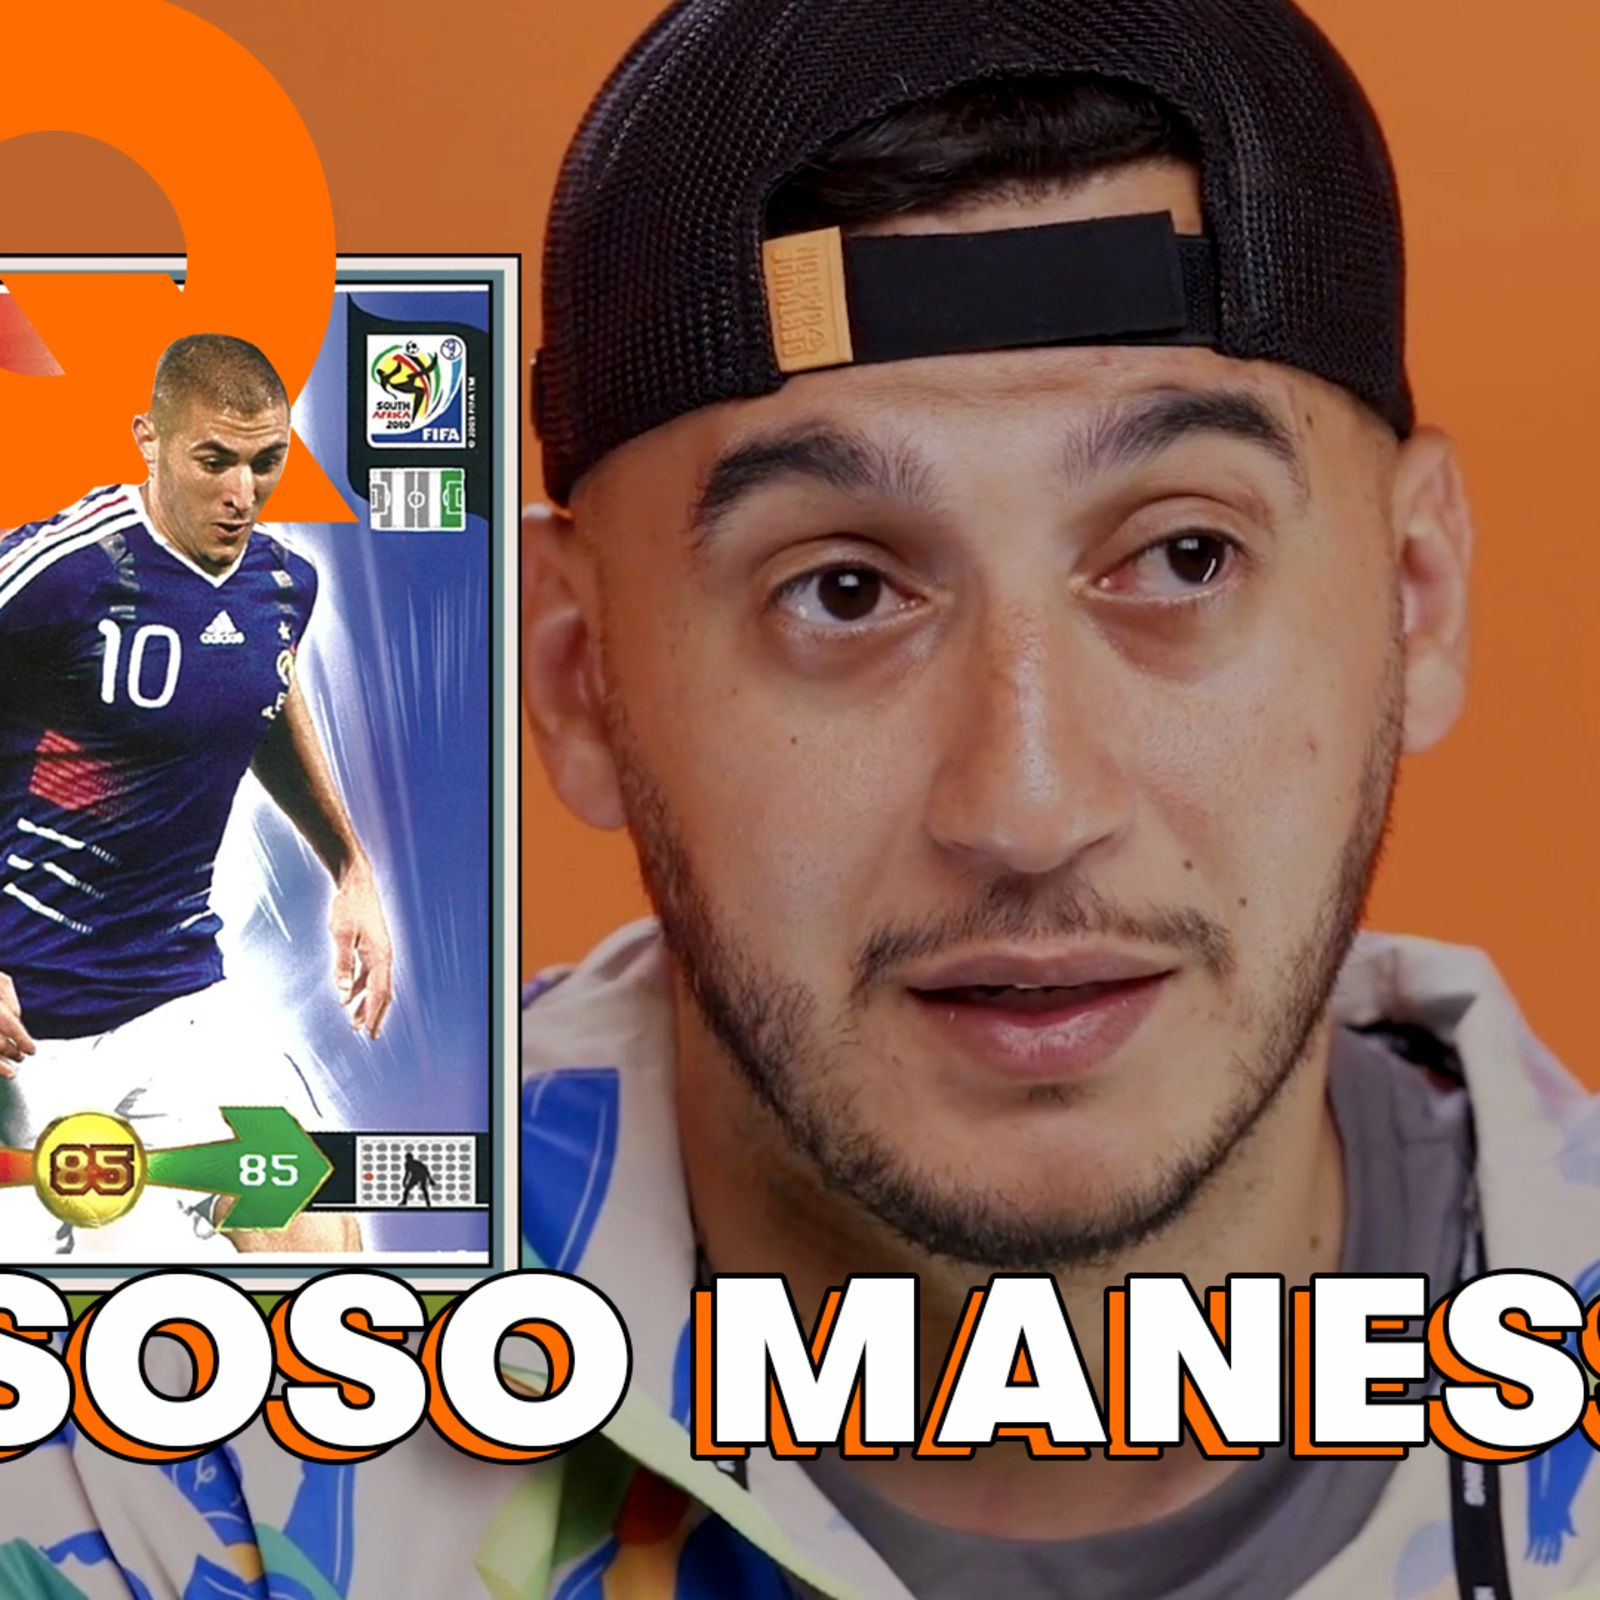 La Tier List football de Soso Maness : Karim Benzema, Lionel Messi, Neymar